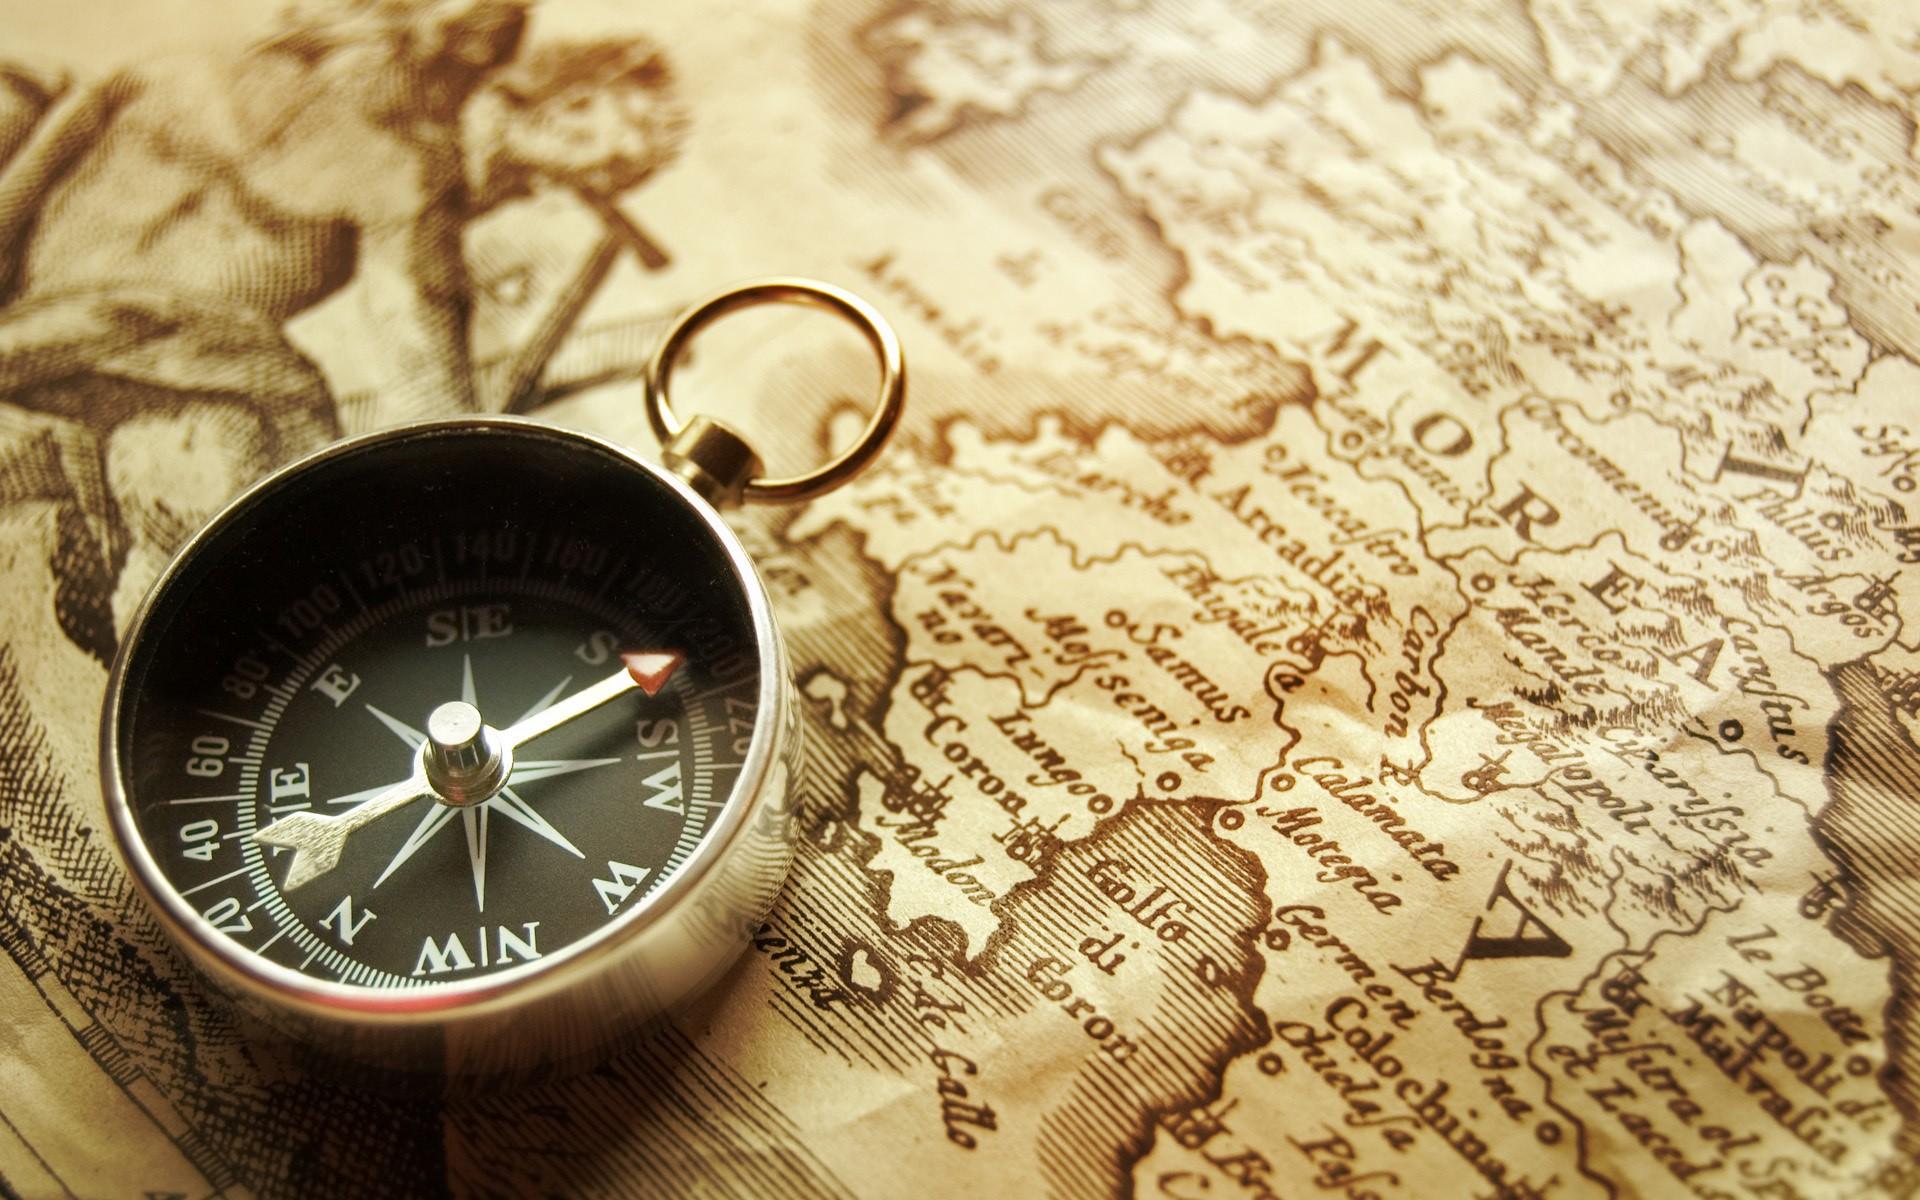 Taustakuvat Kartta Kompassi Tyokalu Kasi 1920x1200 Px